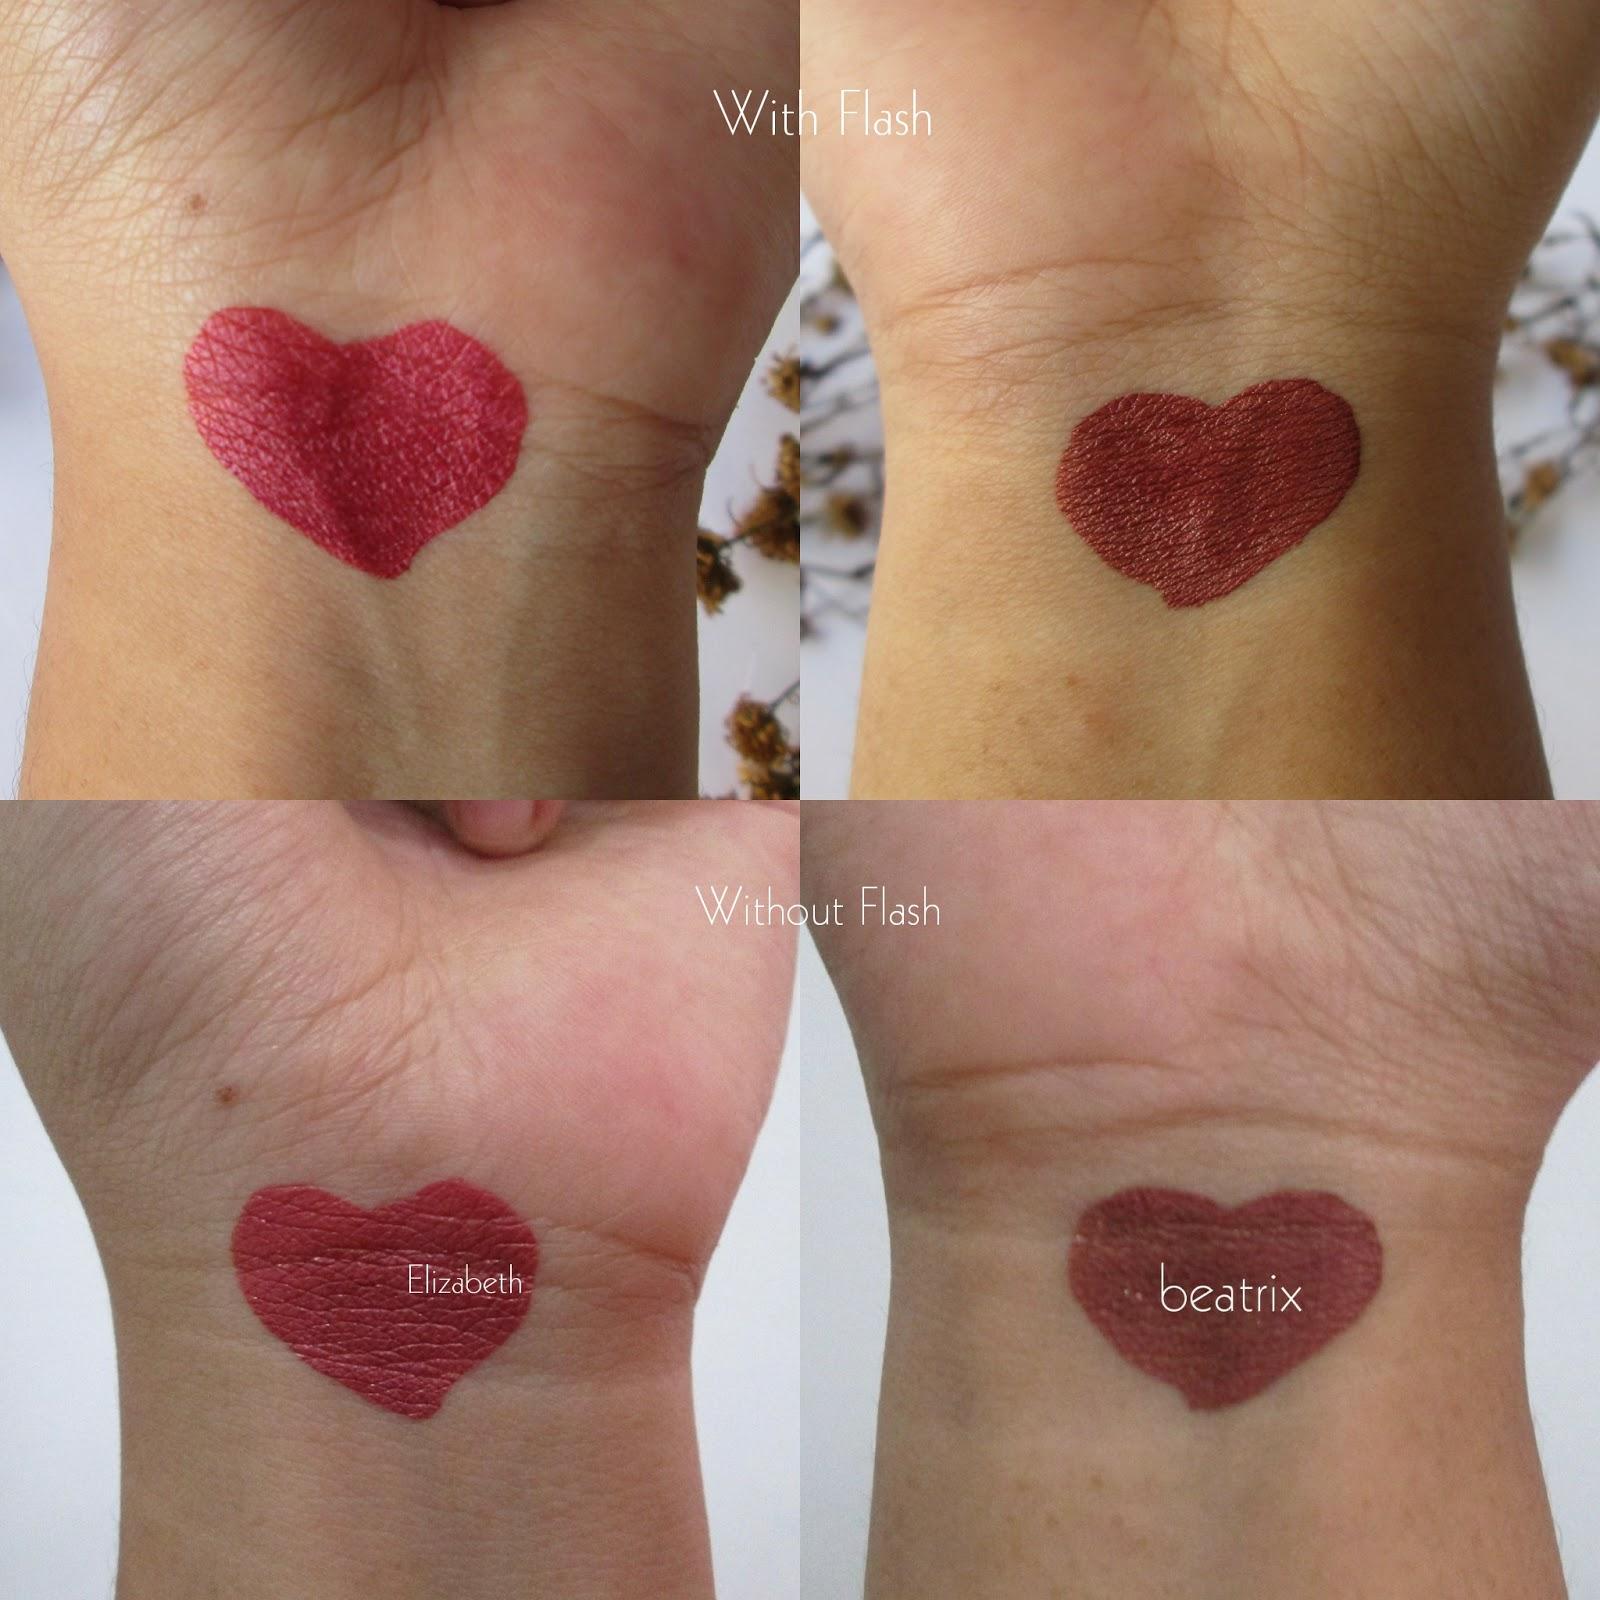 Zoya Lip Paint Metallic Series Elizabeth Dan Beatrix Review Swatch Diatas